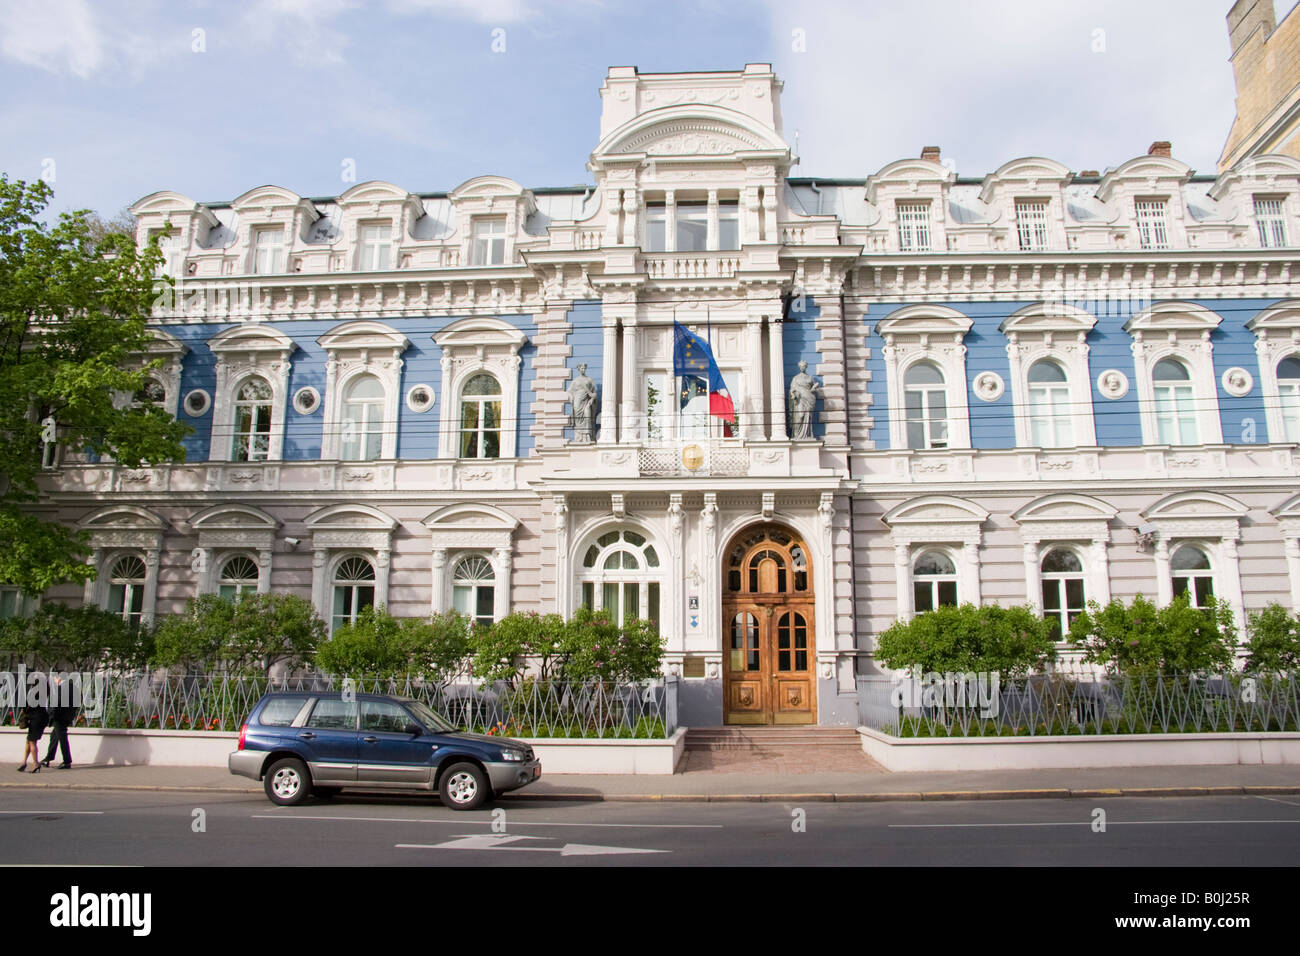 ambassade de france en lettonie france embassy in latvia stock photo royalty free image. Black Bedroom Furniture Sets. Home Design Ideas